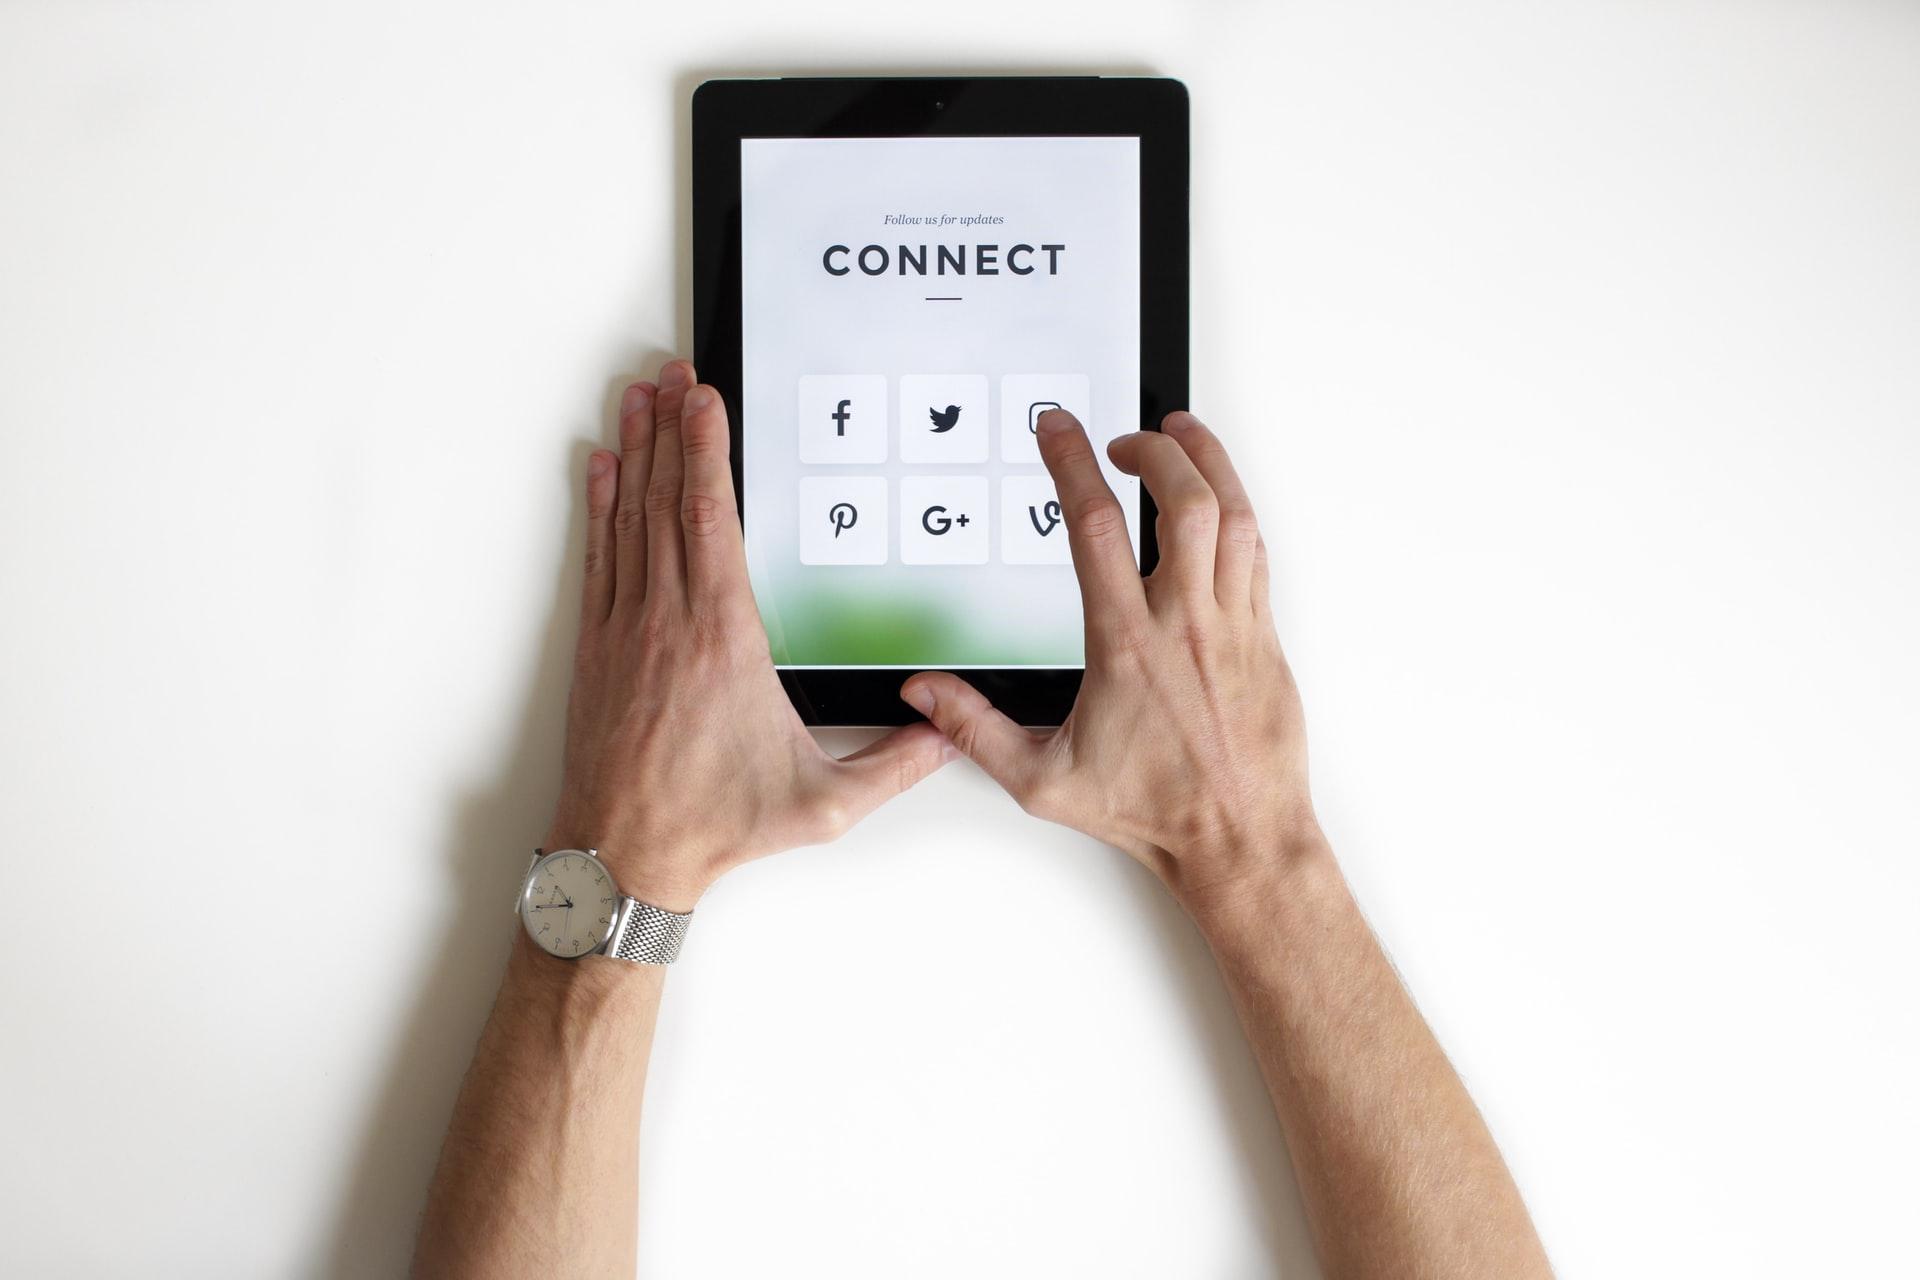 social media affects